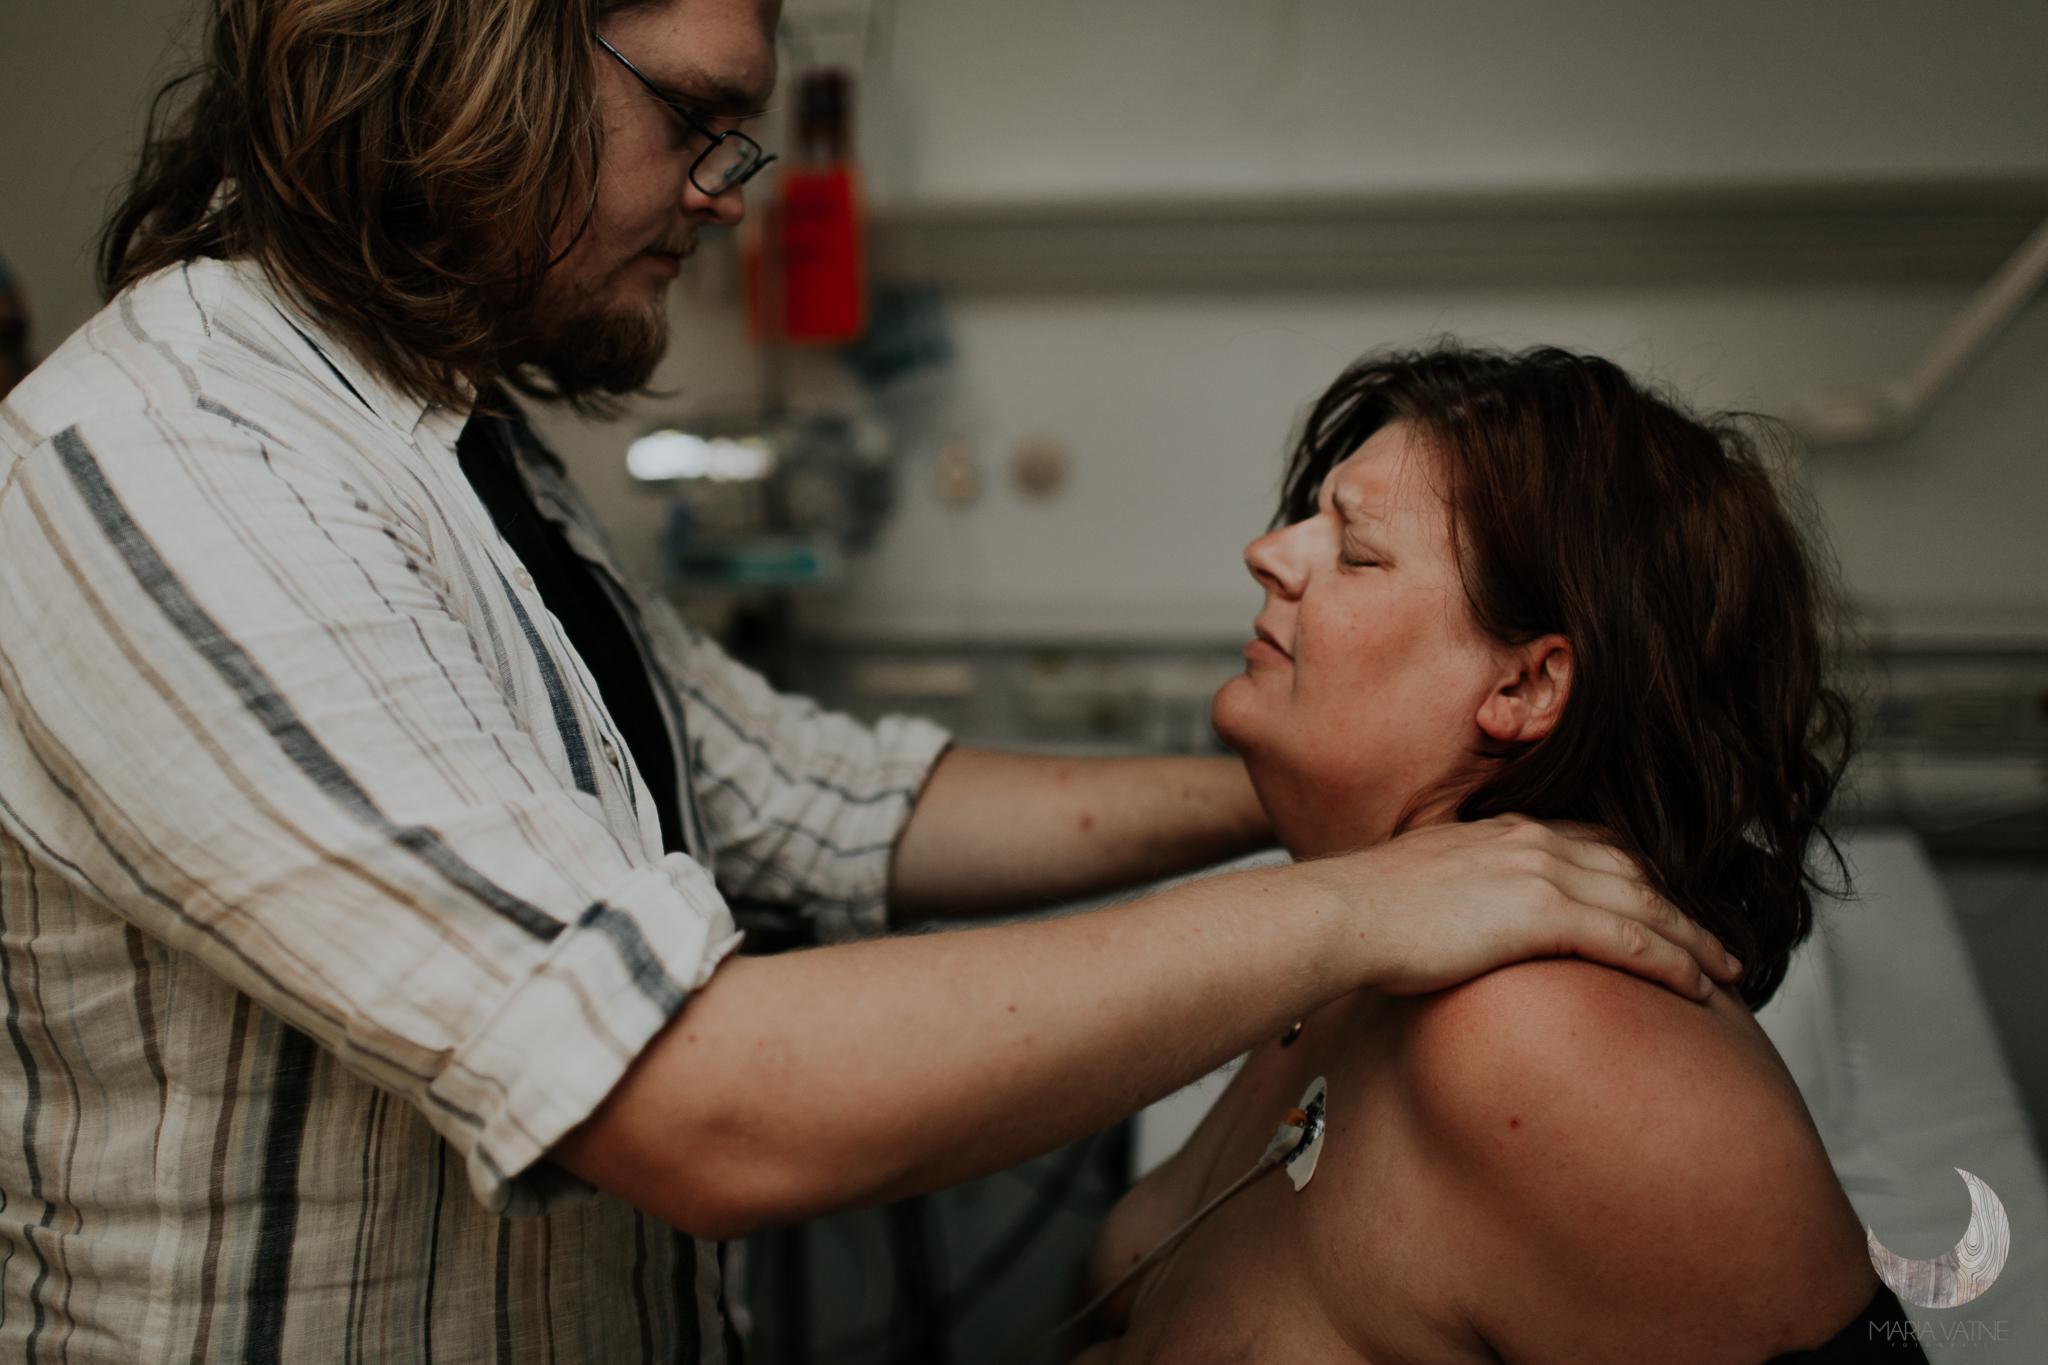 fotograf-fødselsfotograf-kongsberg-oslo-drammen-maria-vatne-nyfødtfotografering-104.jpg